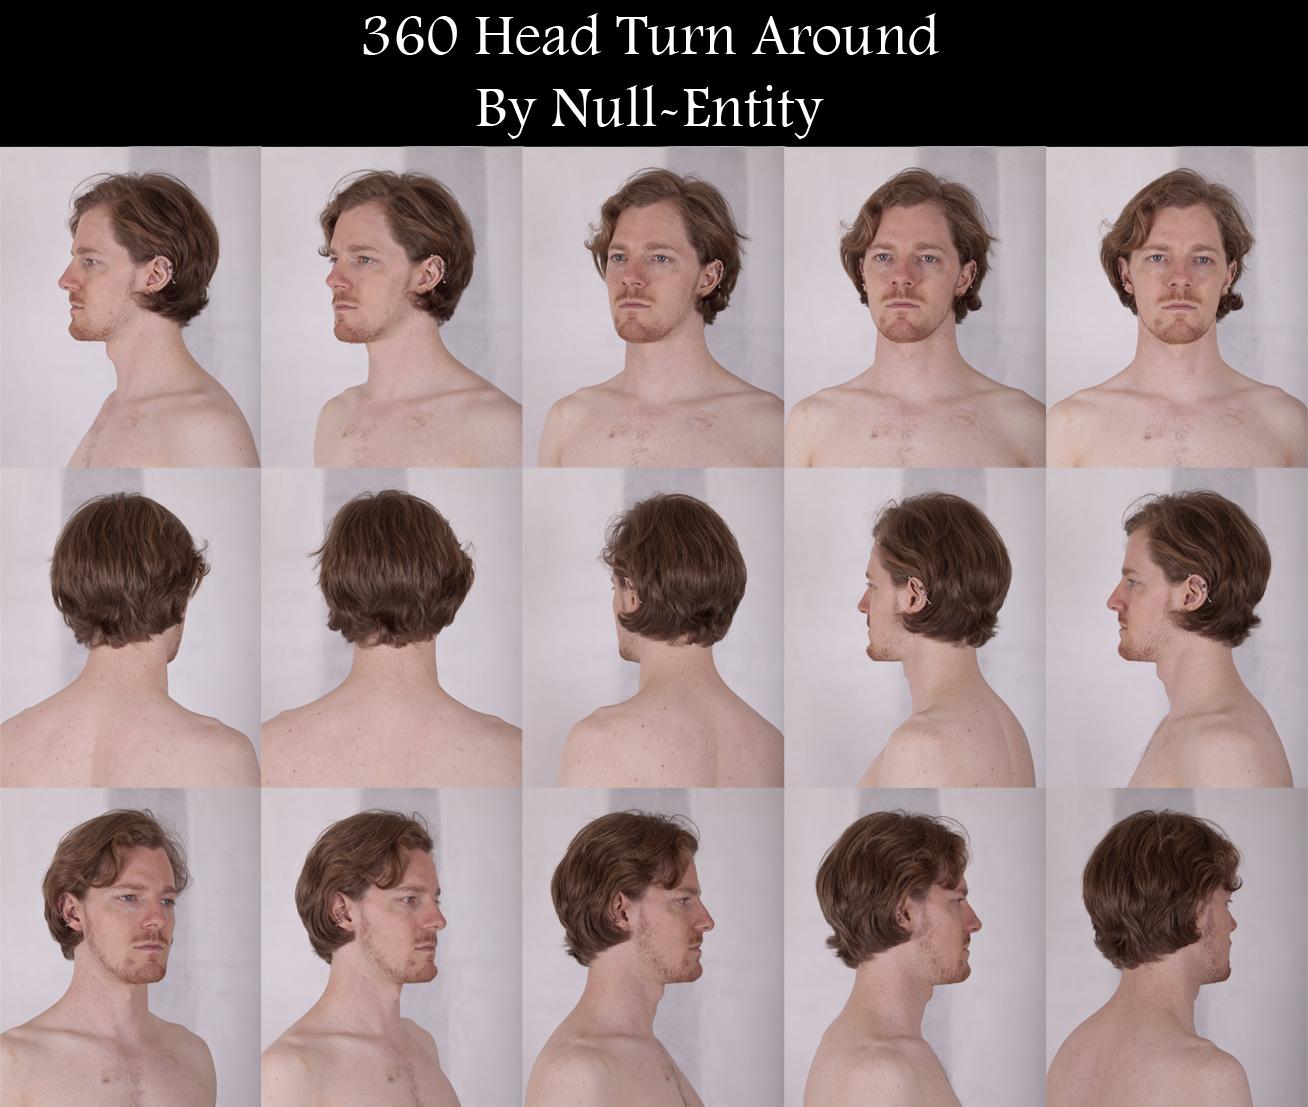 360 Head Turn Around by Null-Entity